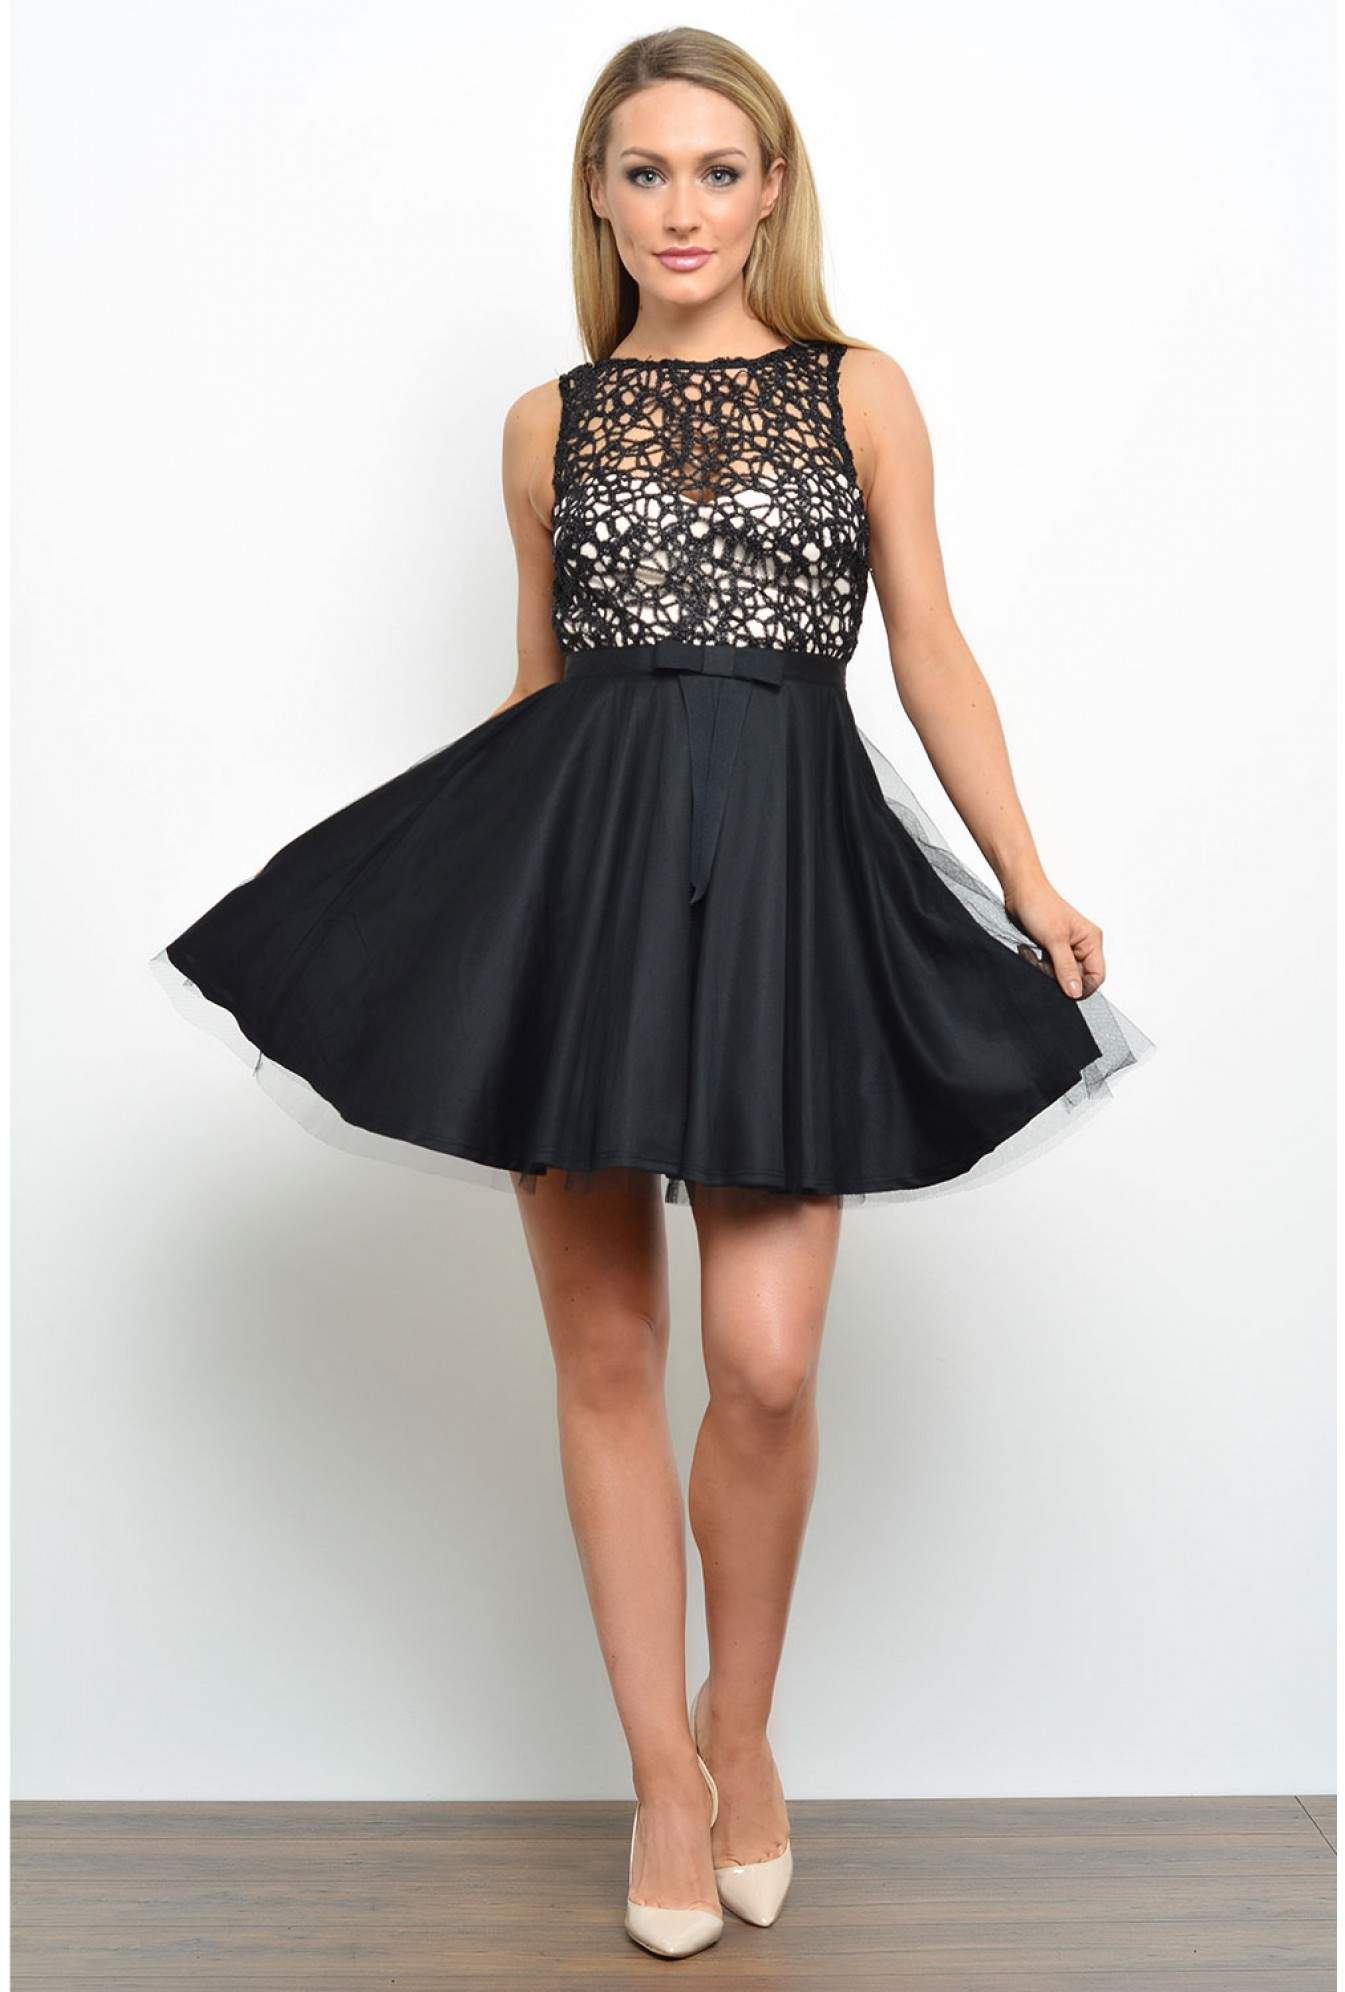 Lipsy Lipsy Lace Top Tutu Prom Dress Iclothing